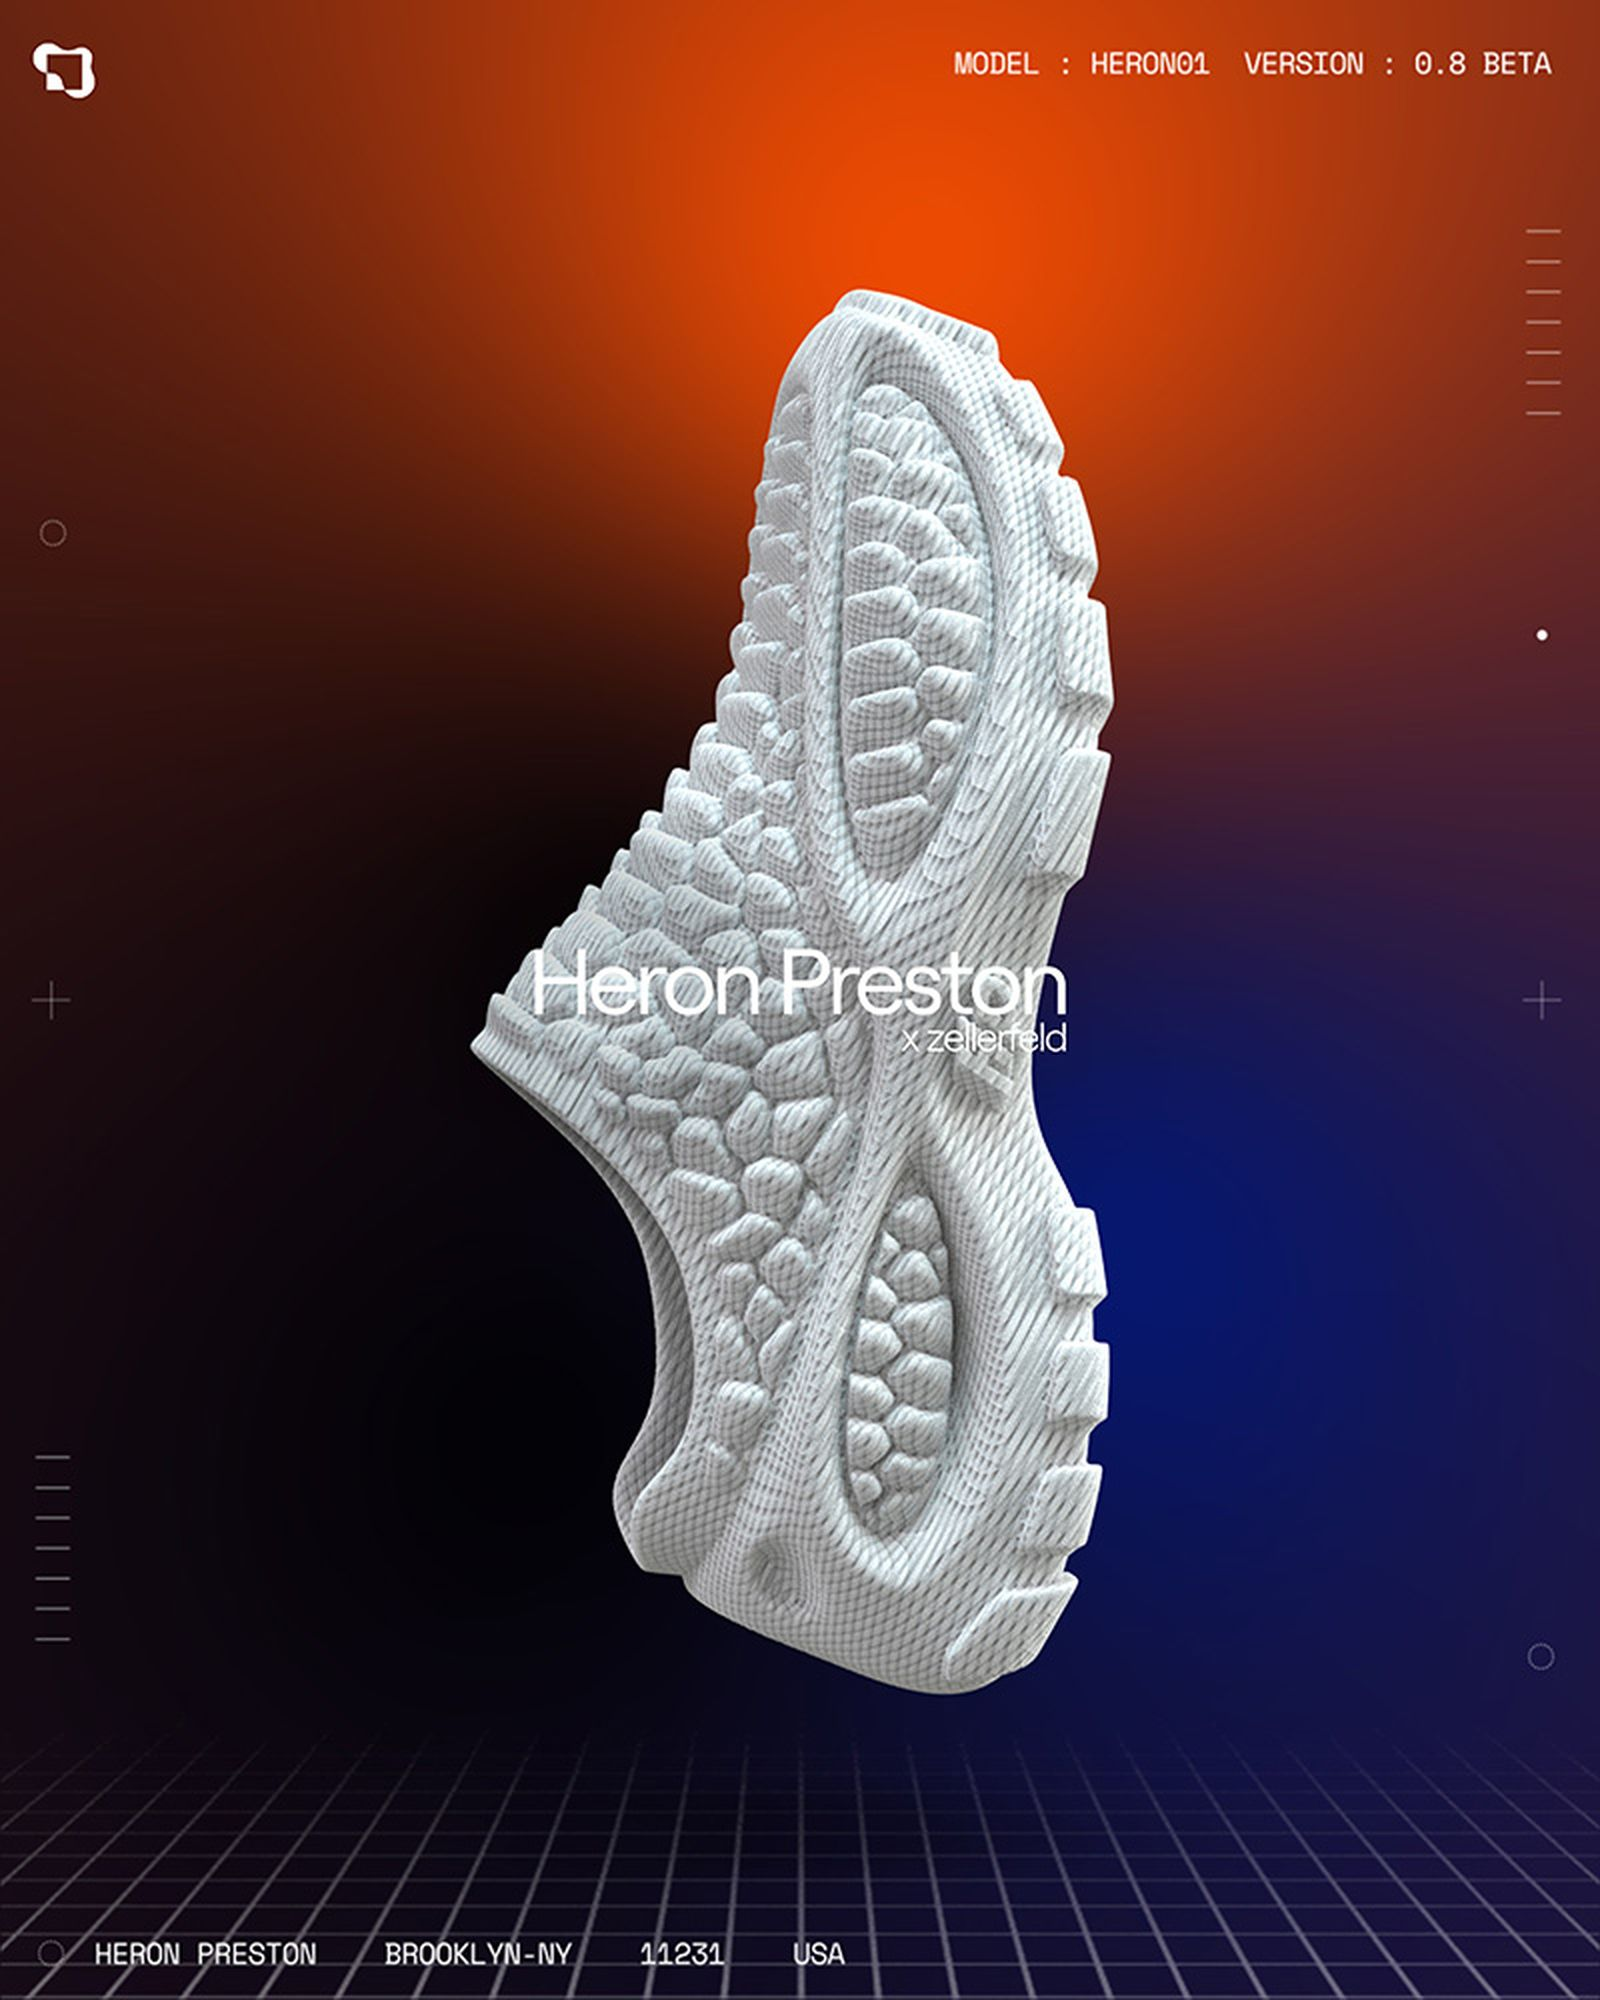 heron-preston-zellerfeld-heron01-release-date-price-06